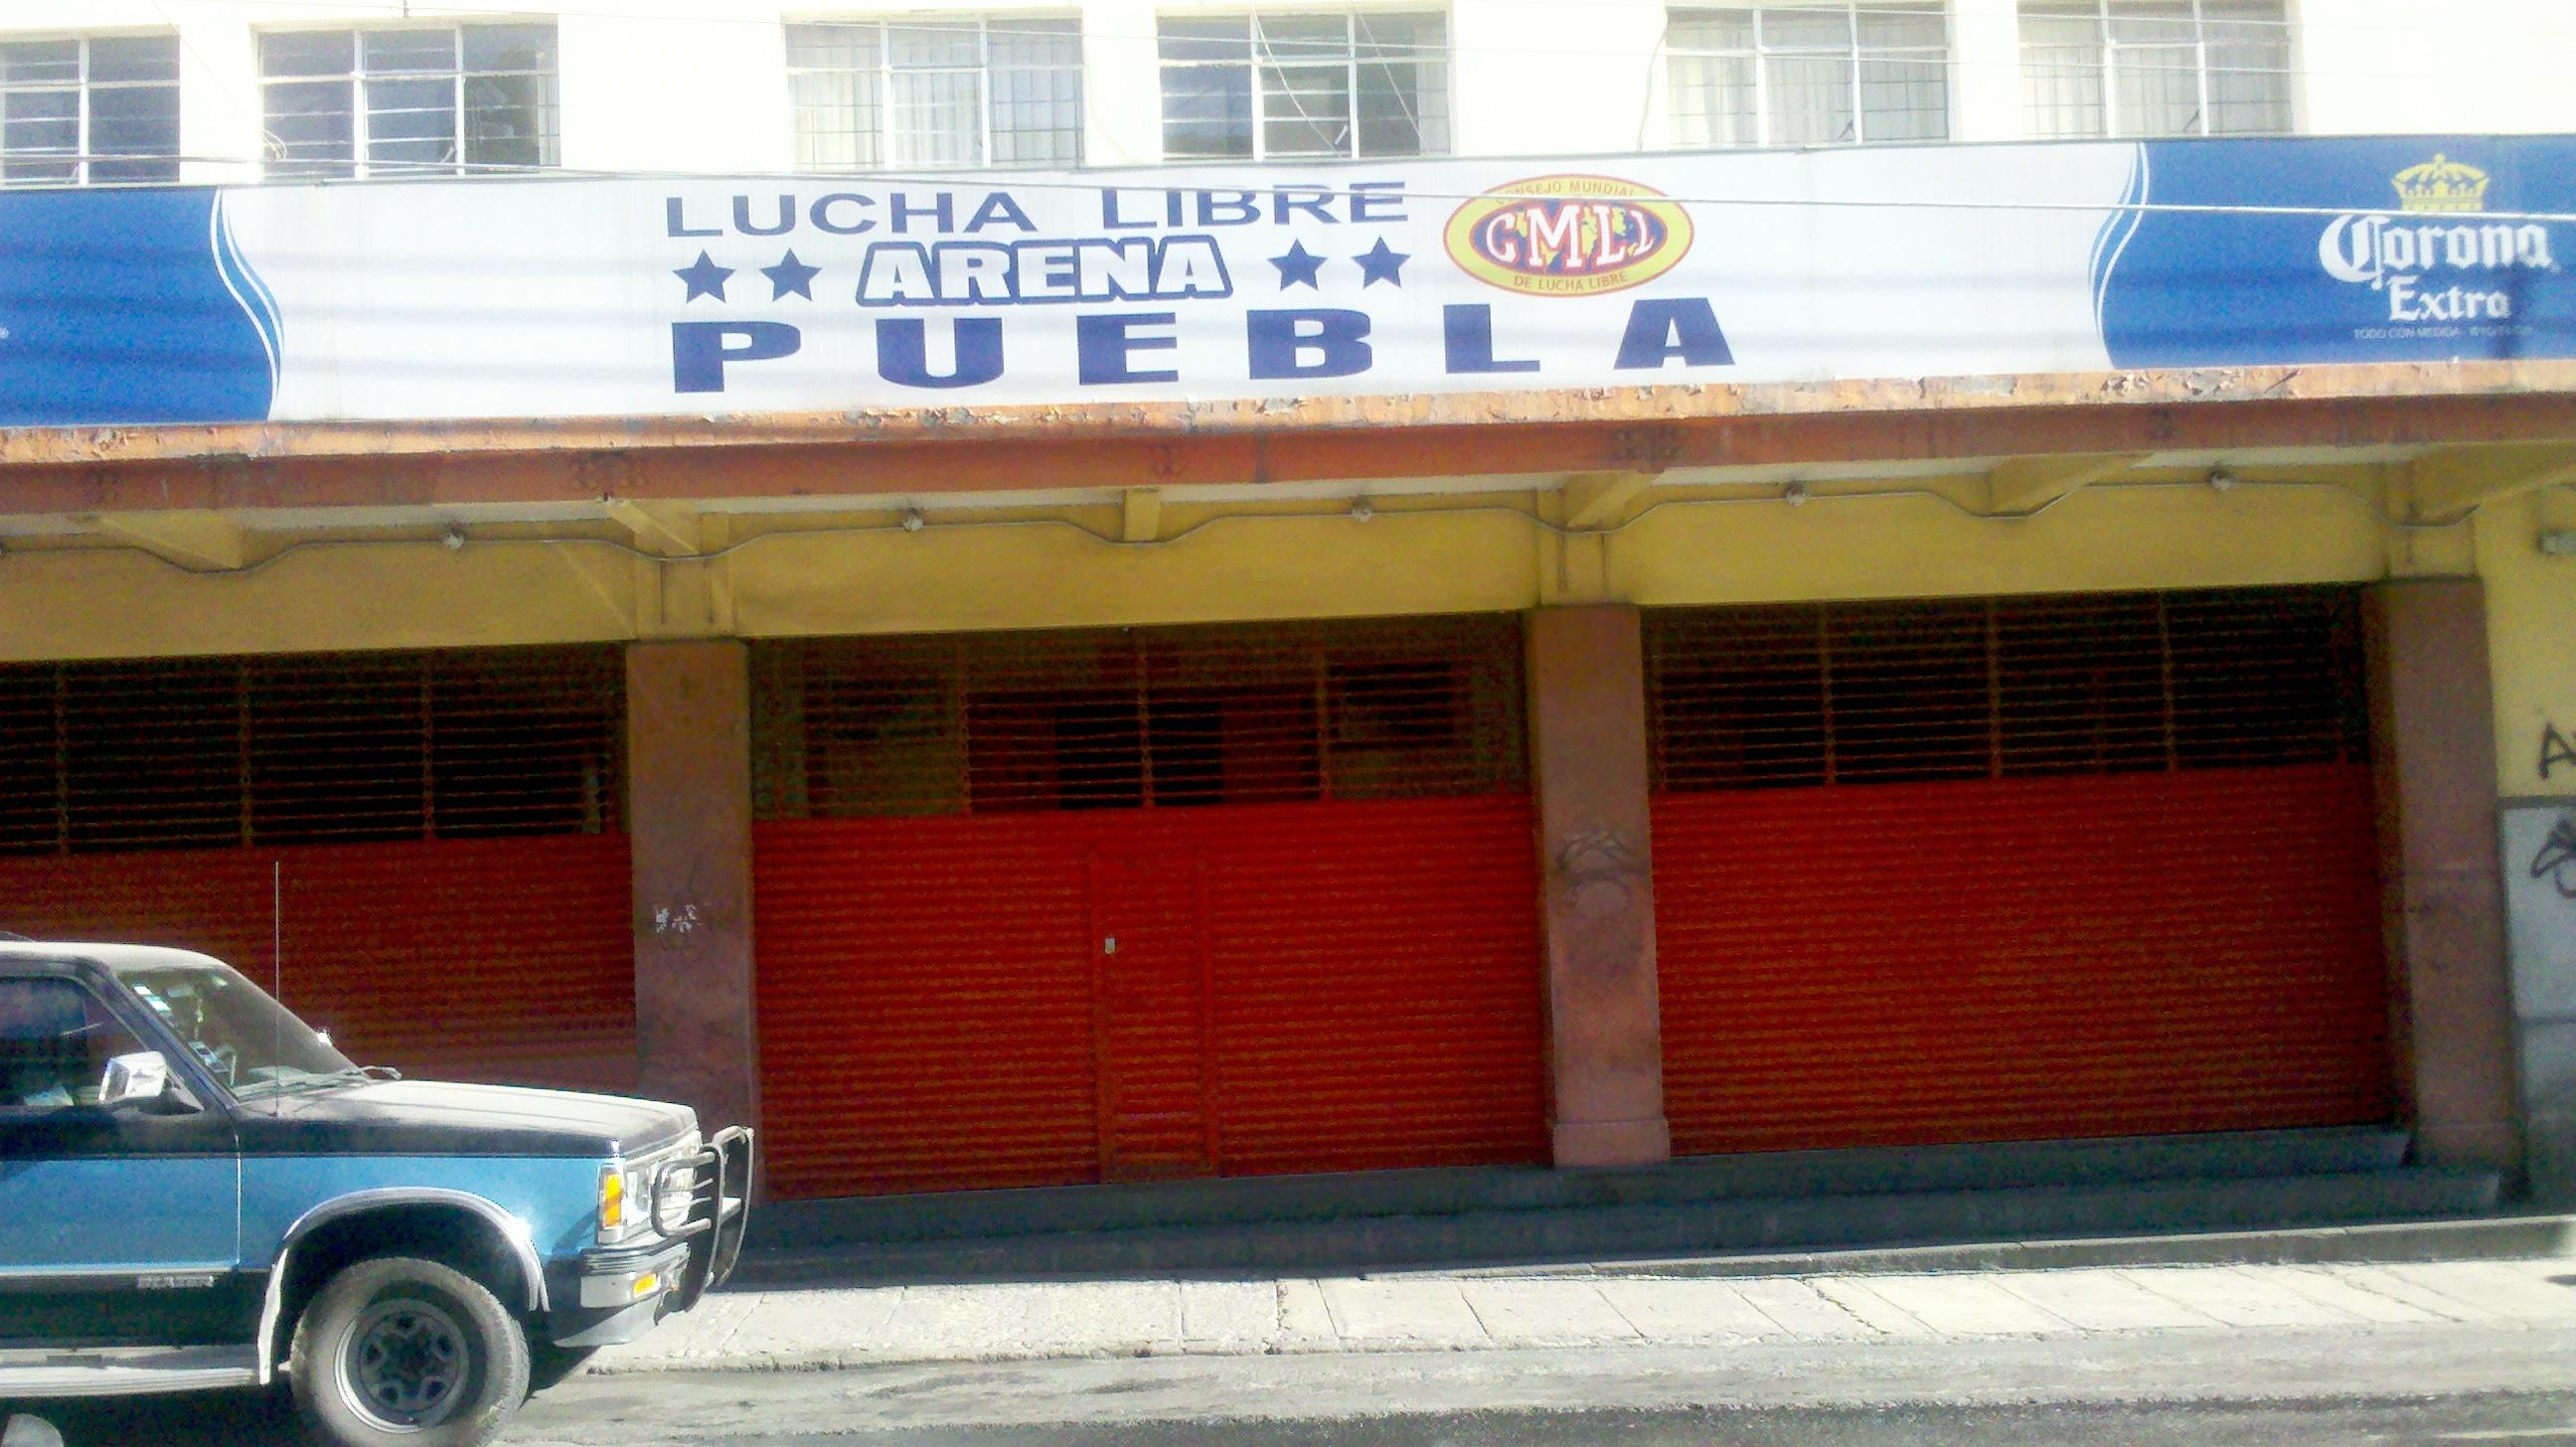 File:Arena Puebla 2.jpg - Wikimedia Commons